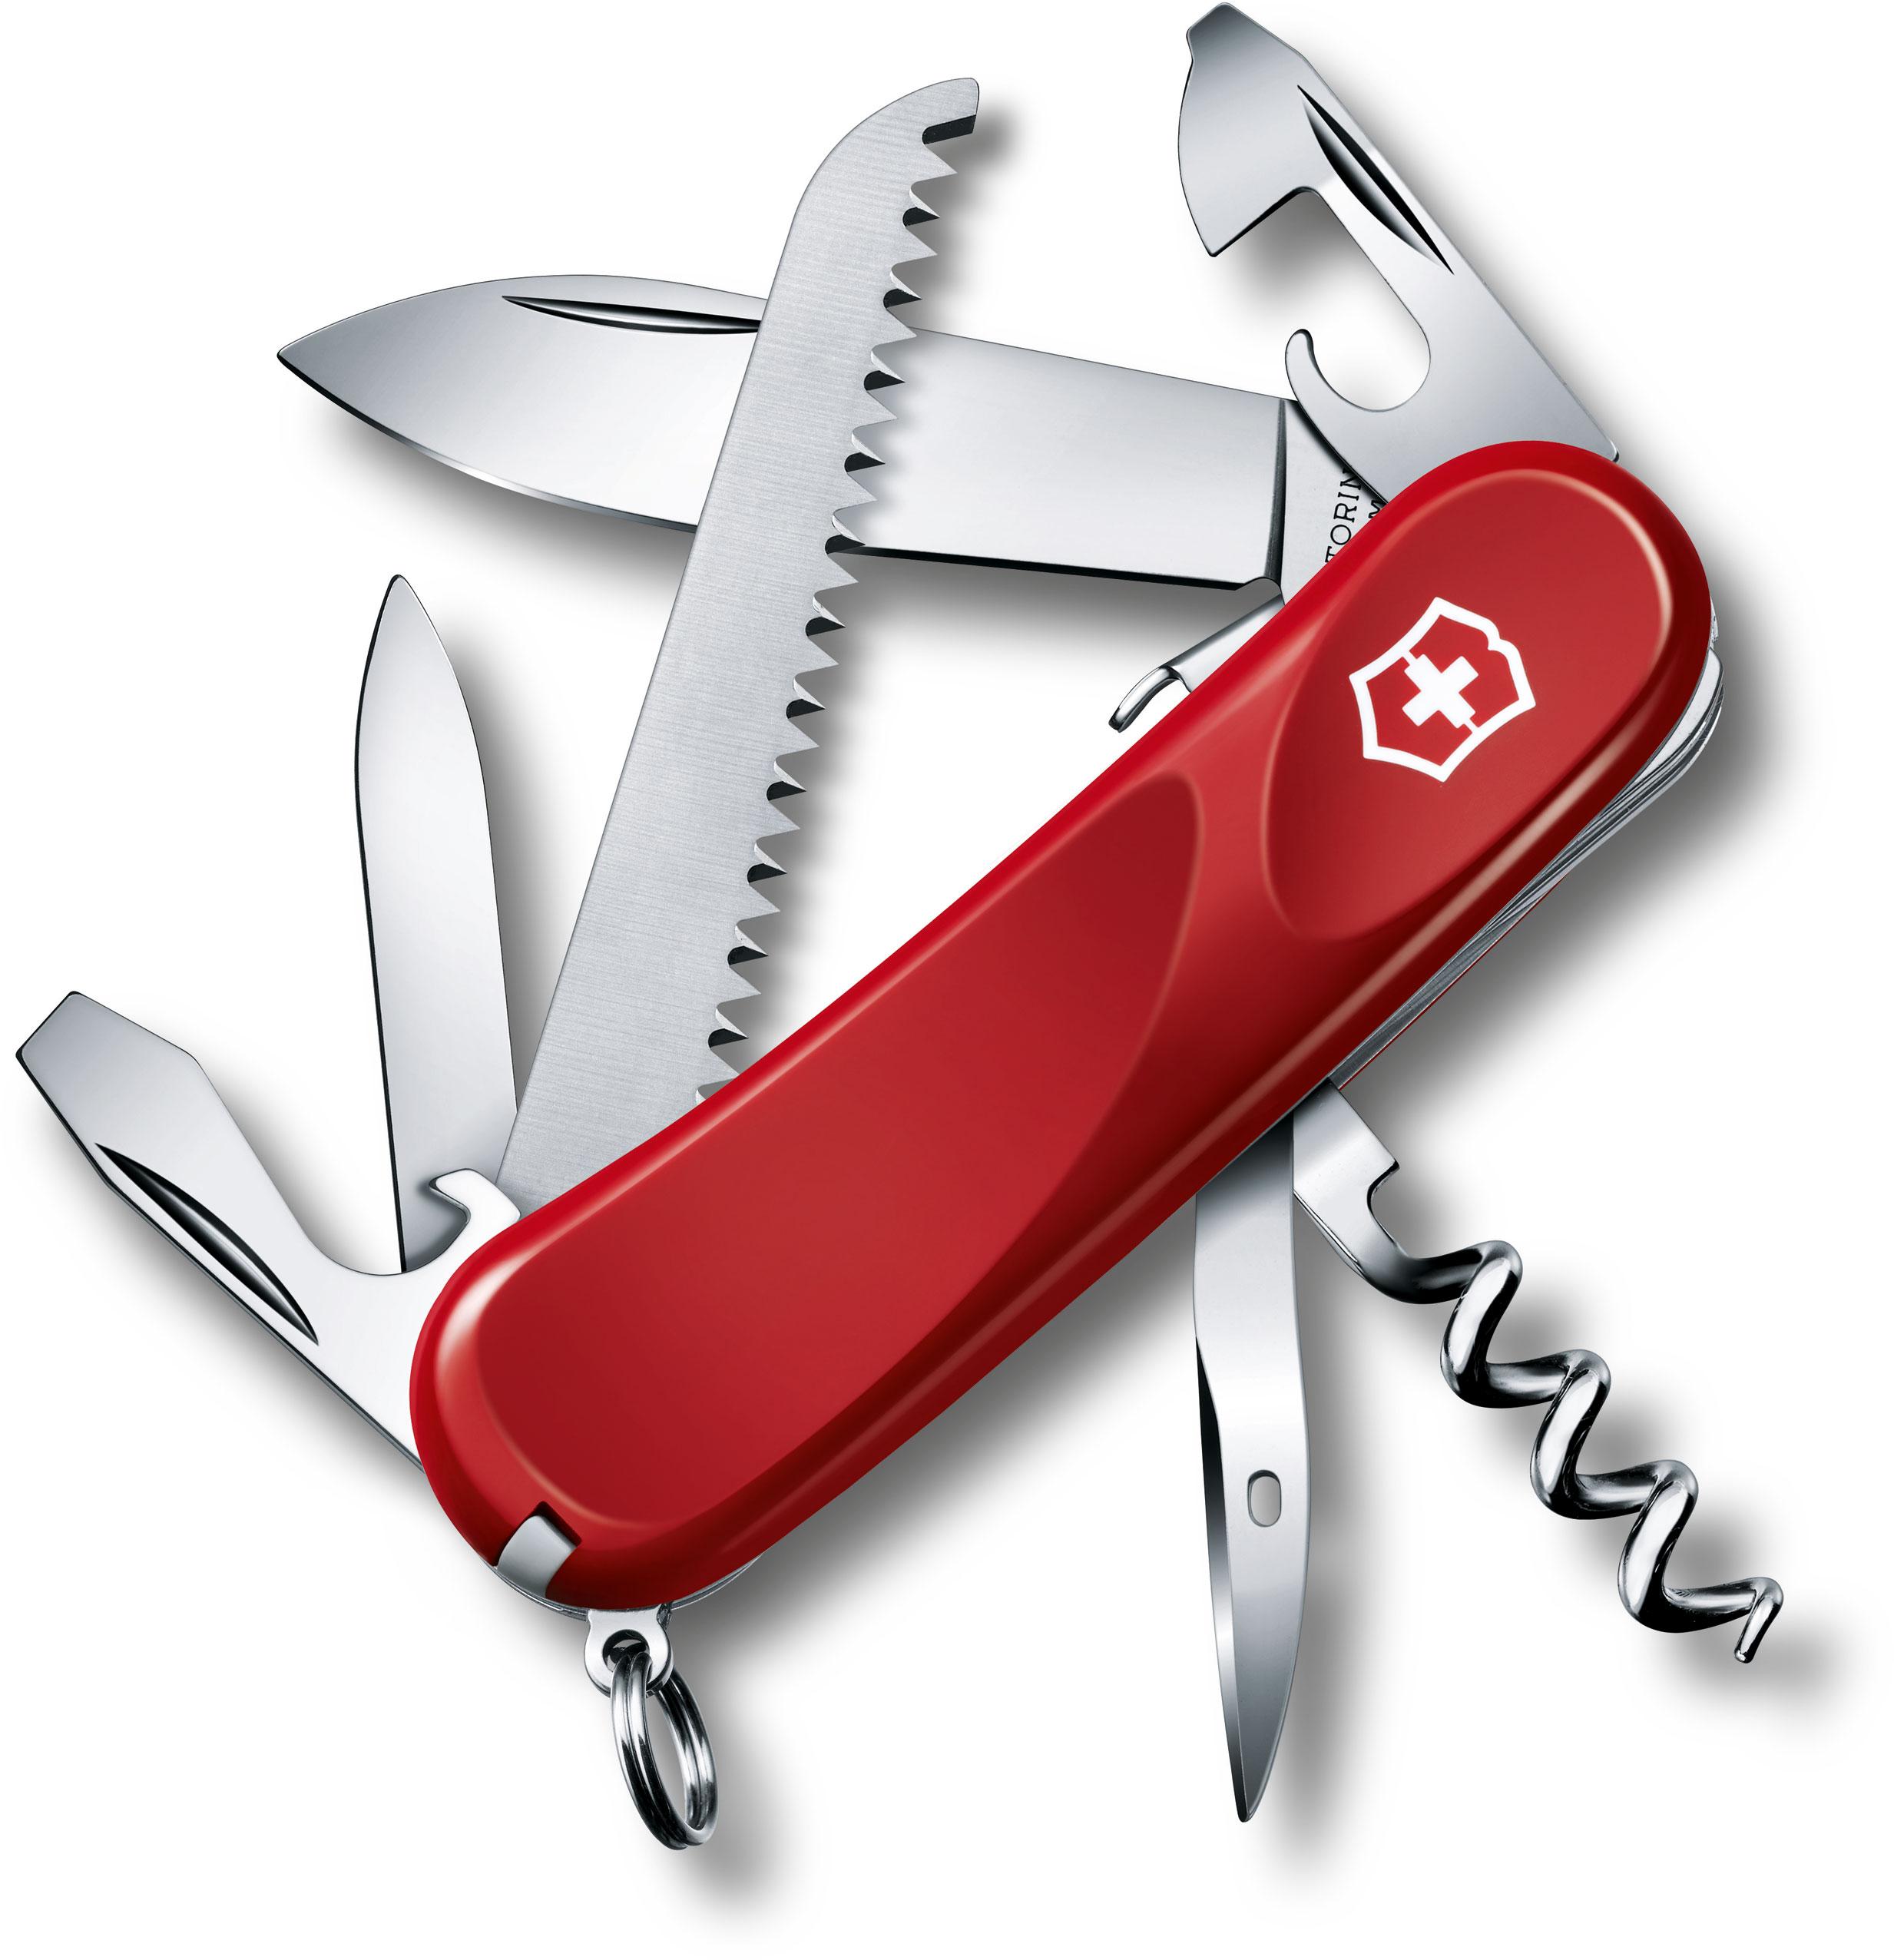 Victorinox Swiss Army 2.3813.SE Locking Evolution S13 Multi-Tool 3-3/8 inch Red Handles